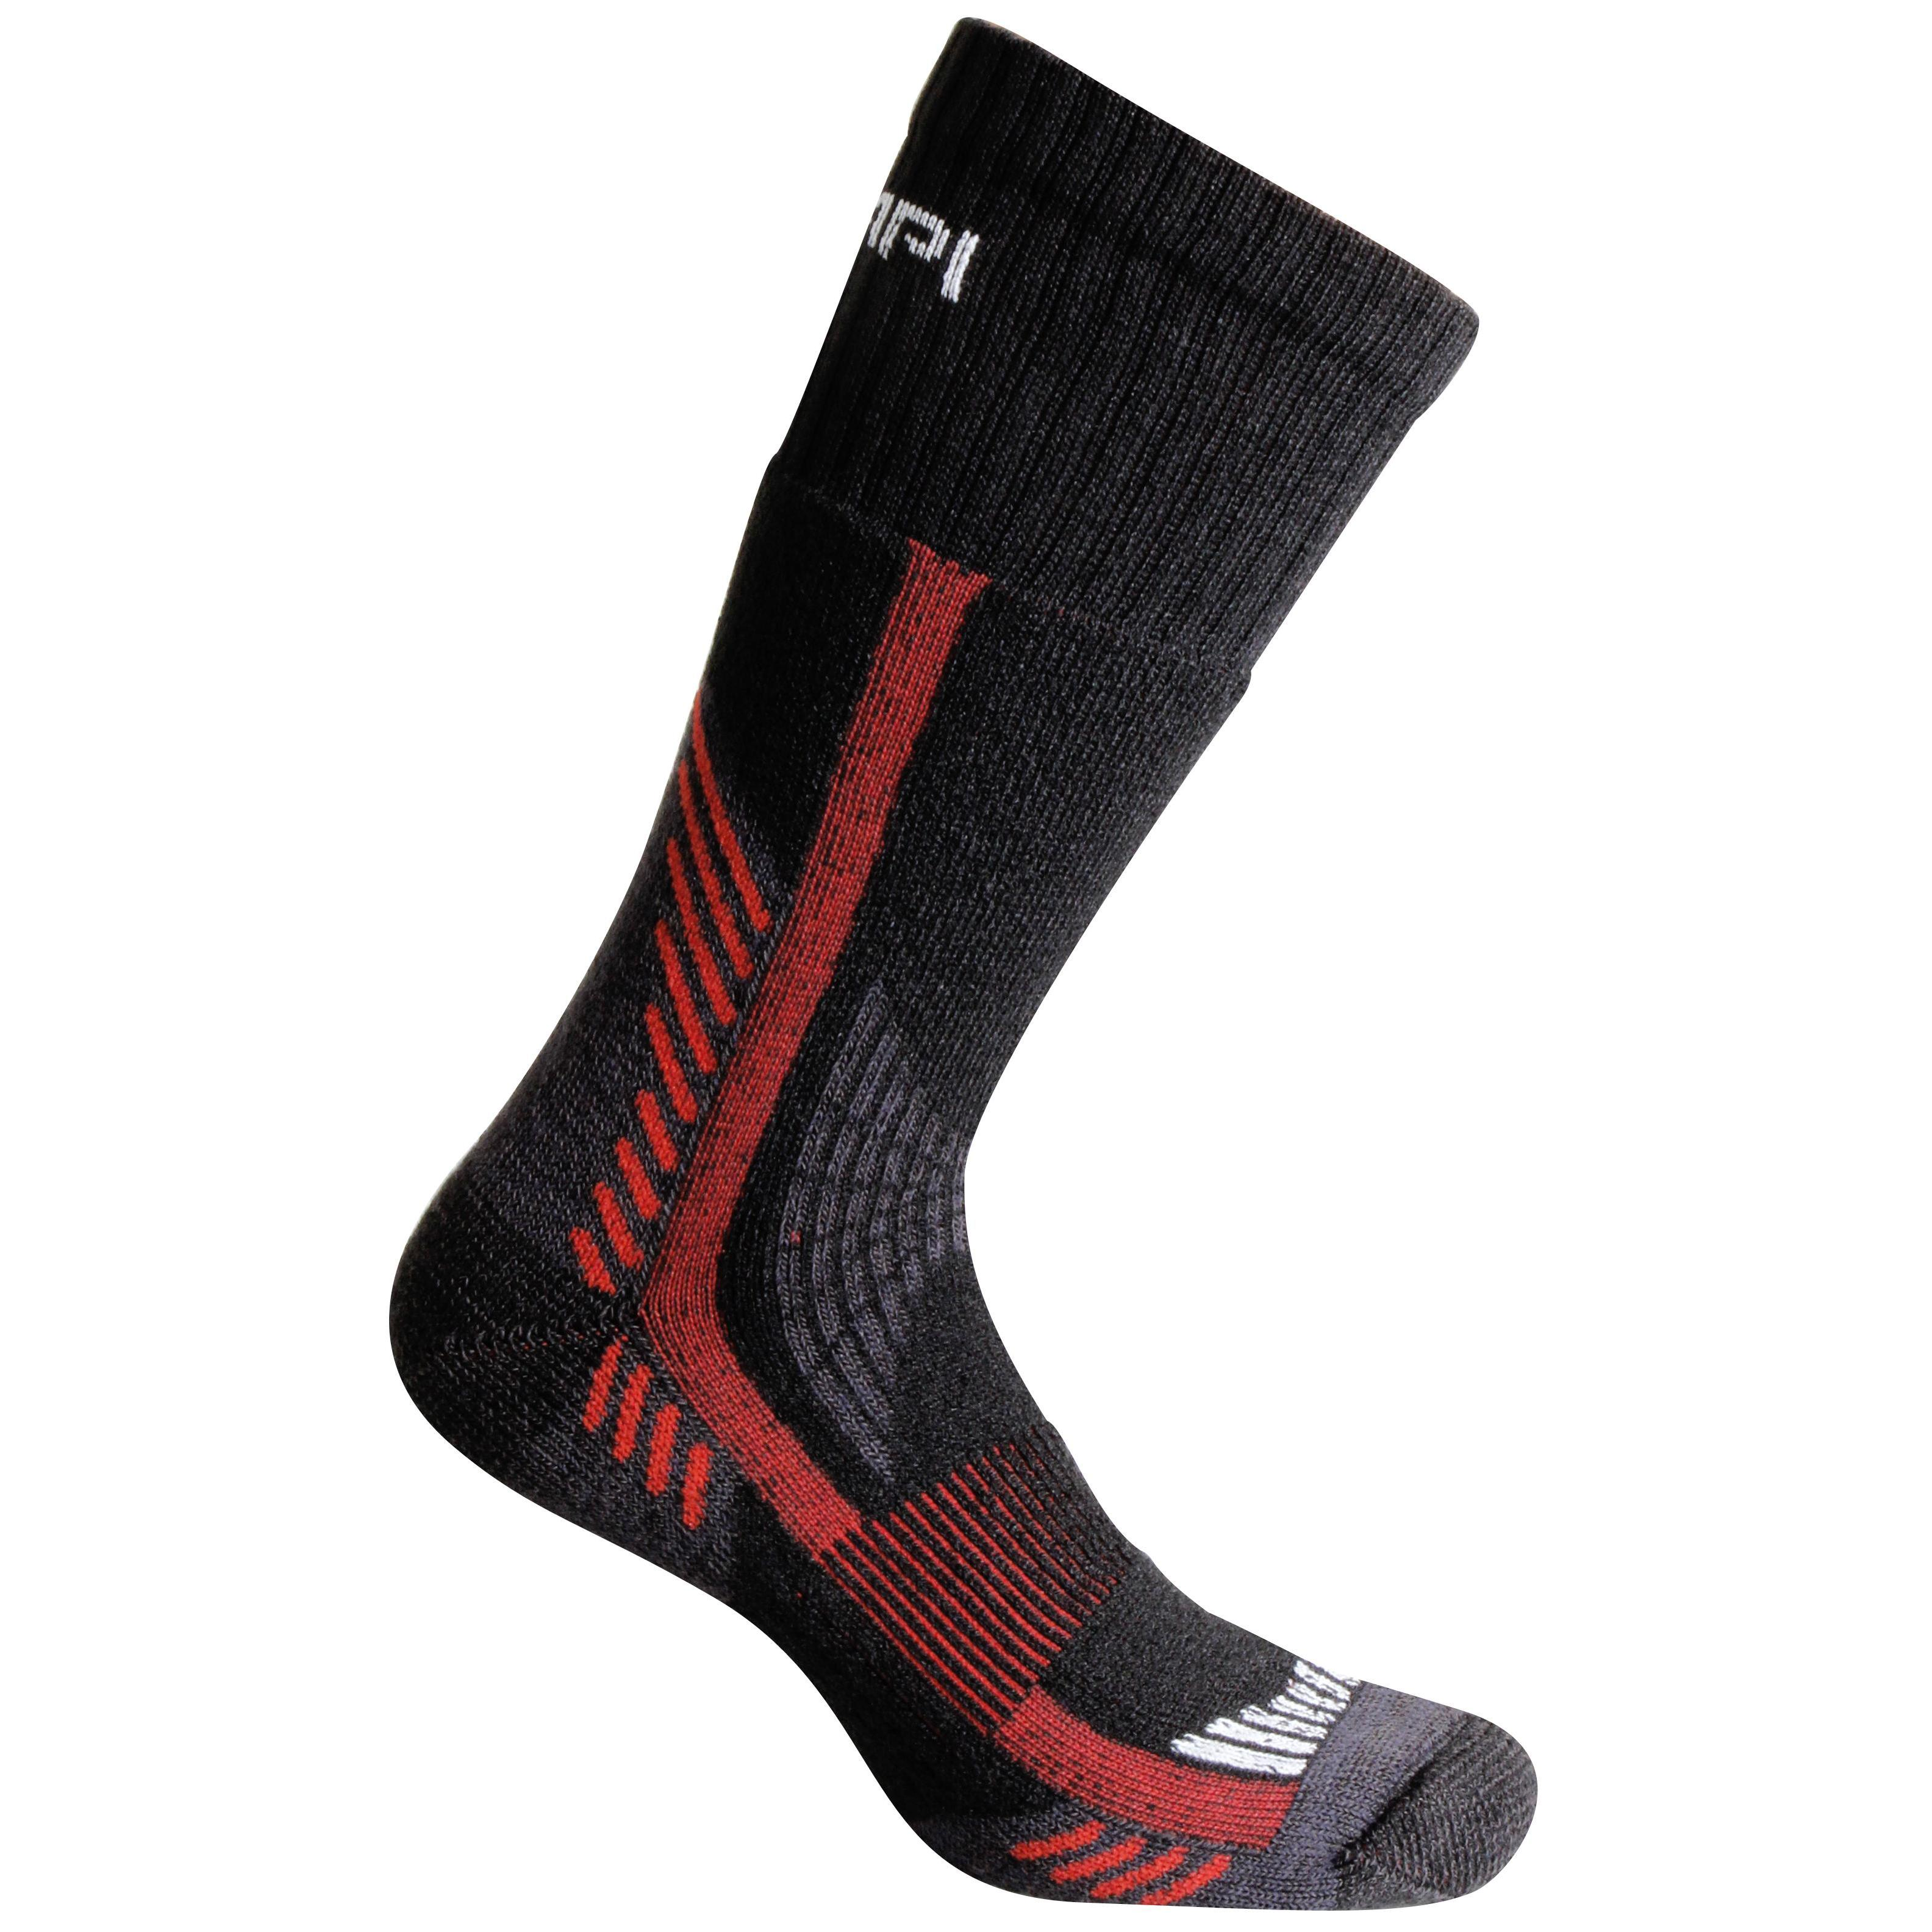 Носки Accapi Trekking Thermic, black/red, 45-47 EU